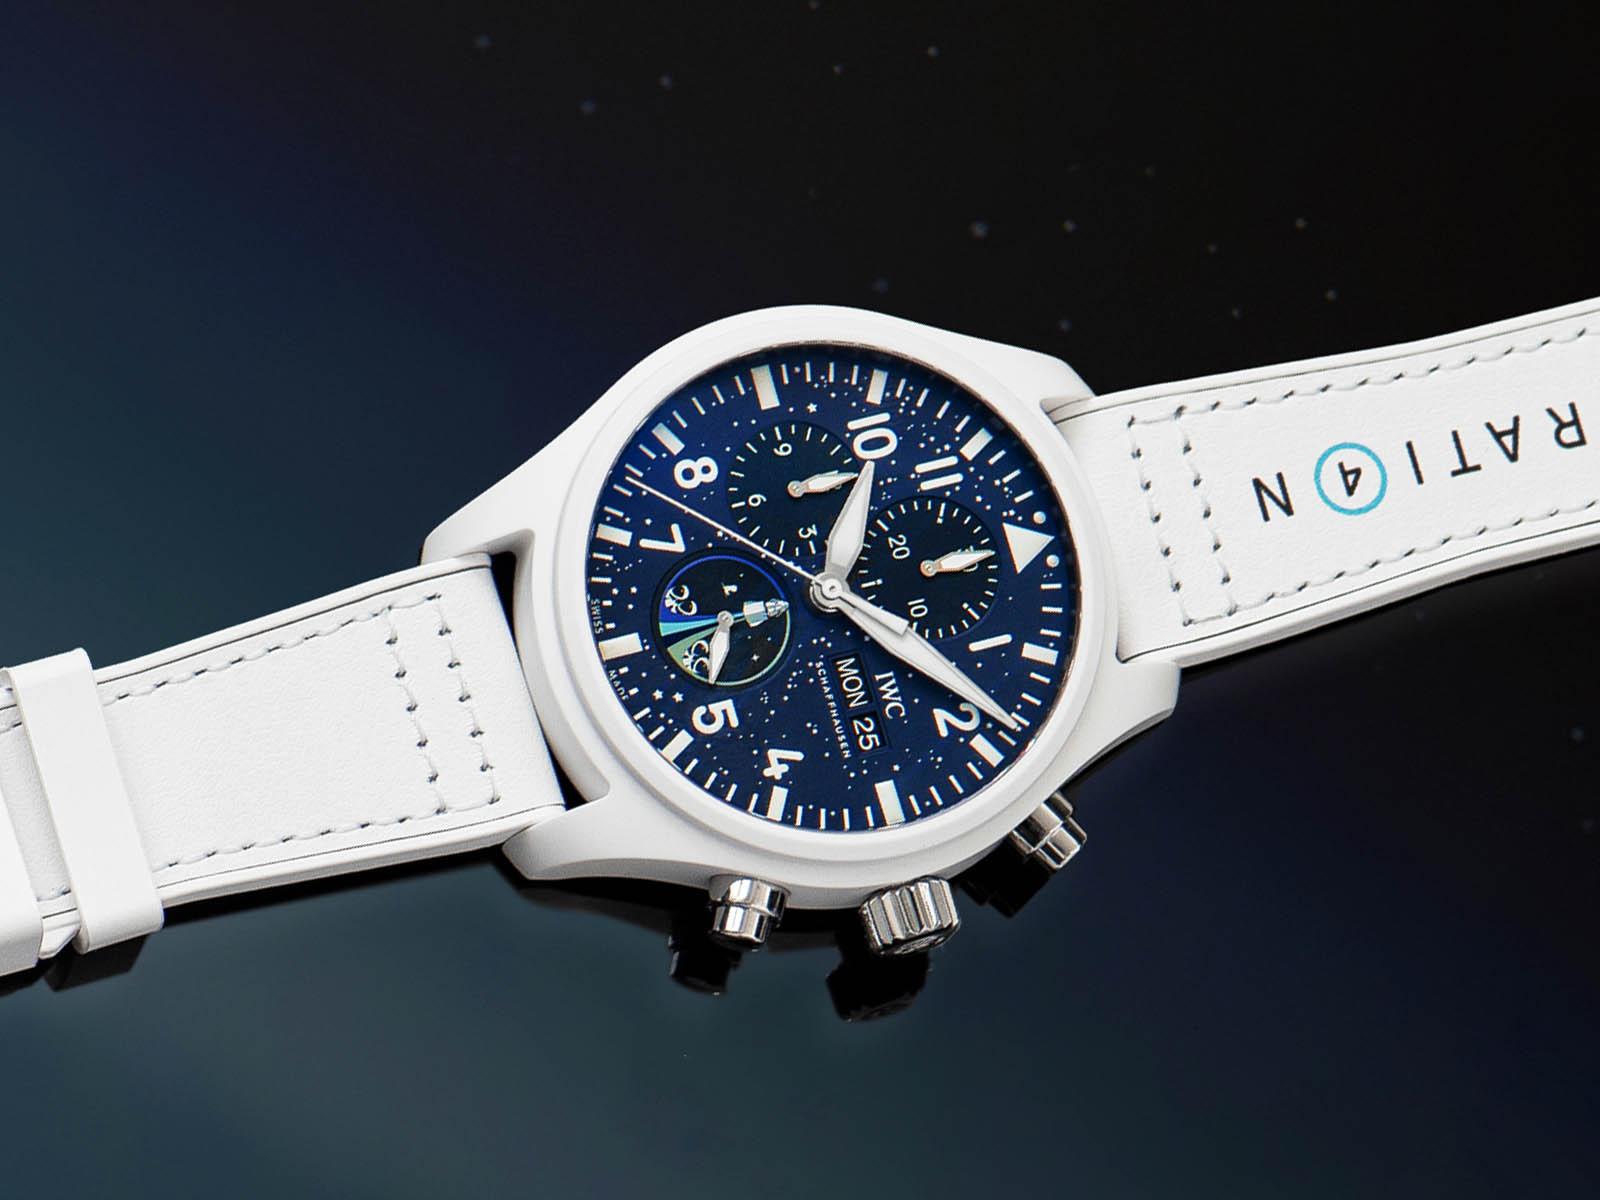 iw389110-iwc-pilot-s-watch-chronograph-edition-inspiration4-4.jpg